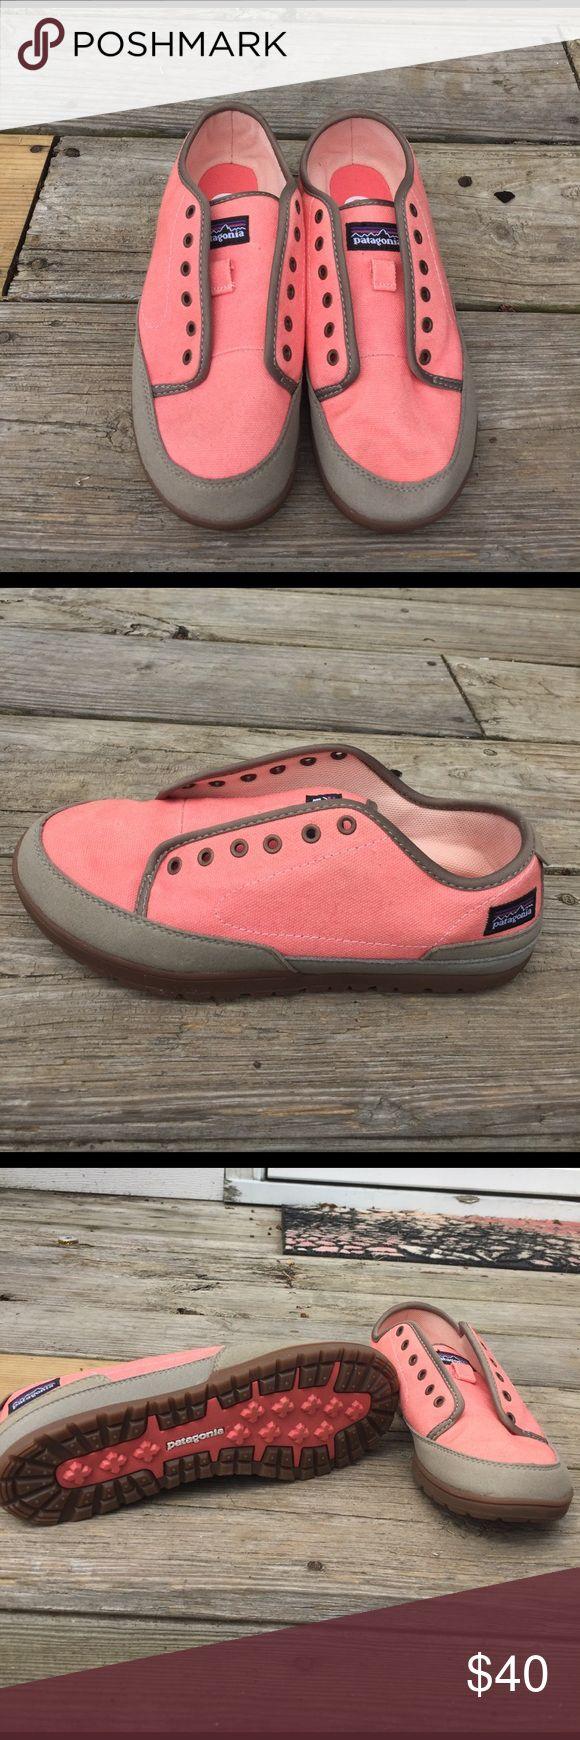 NWOT Patagonia sneakers. Size 7! Coral Patagonia sneakers. Size 7. Never worn! Patagonia Shoes Sneakers